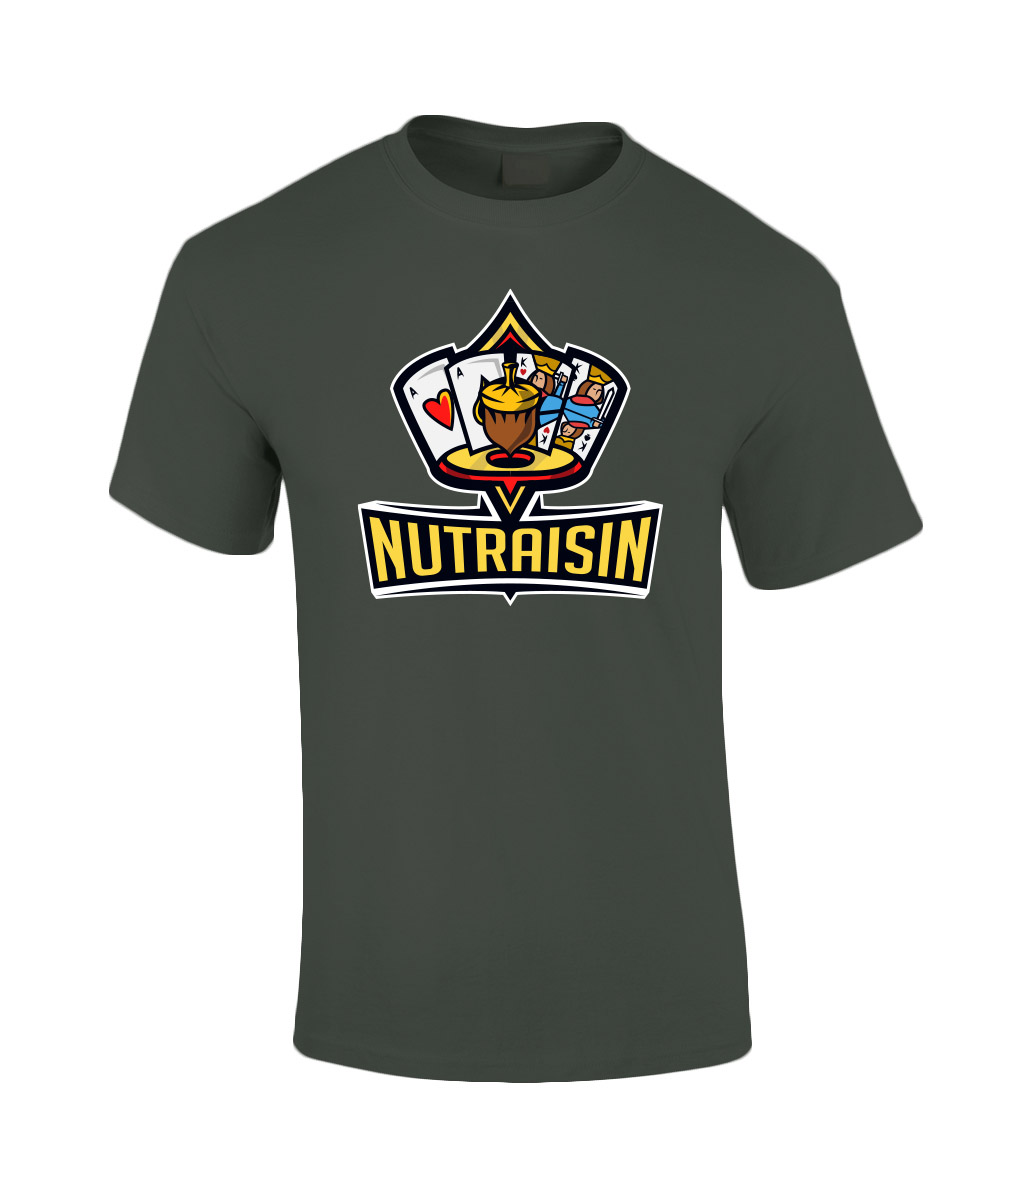 NutRaisin-Unisex-T-MilitaryGreen